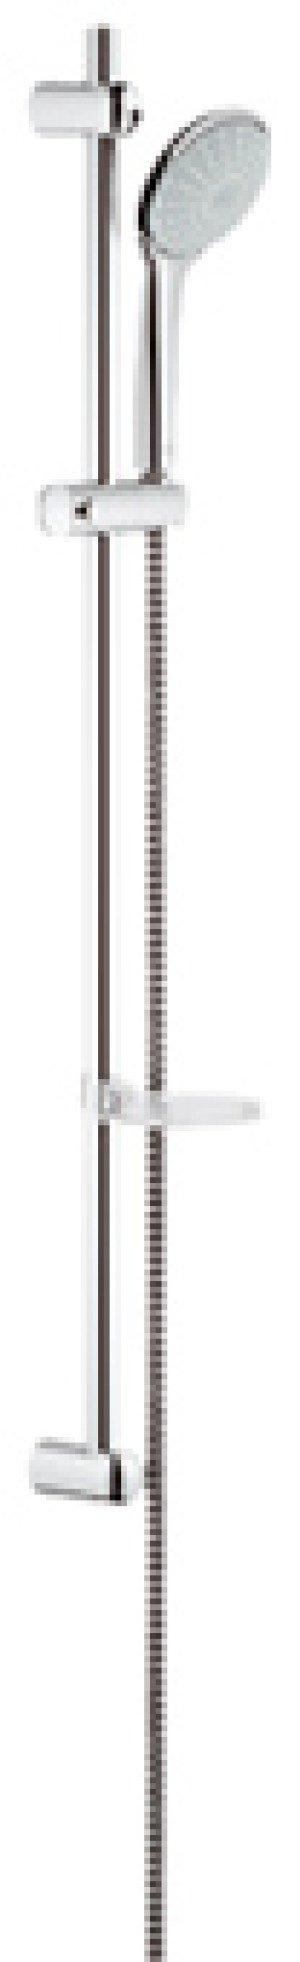 Grohe Euphoria glijstangset m. handdouche Mono 90cm - 27267001